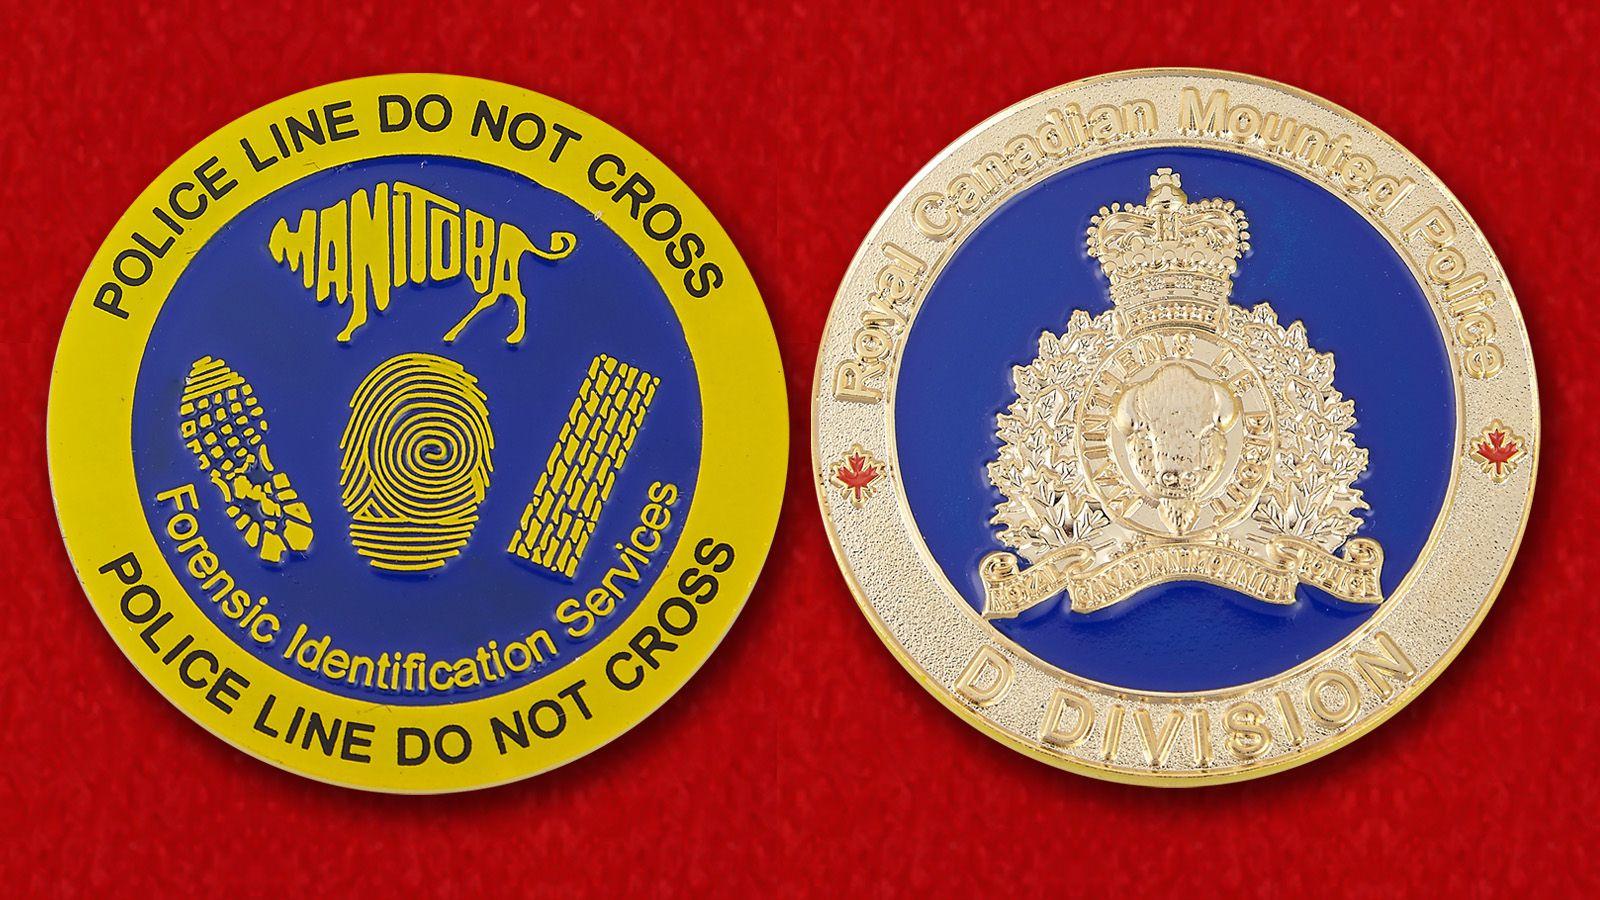 Челлендж коин полиции Манитобы - аверс и реверс